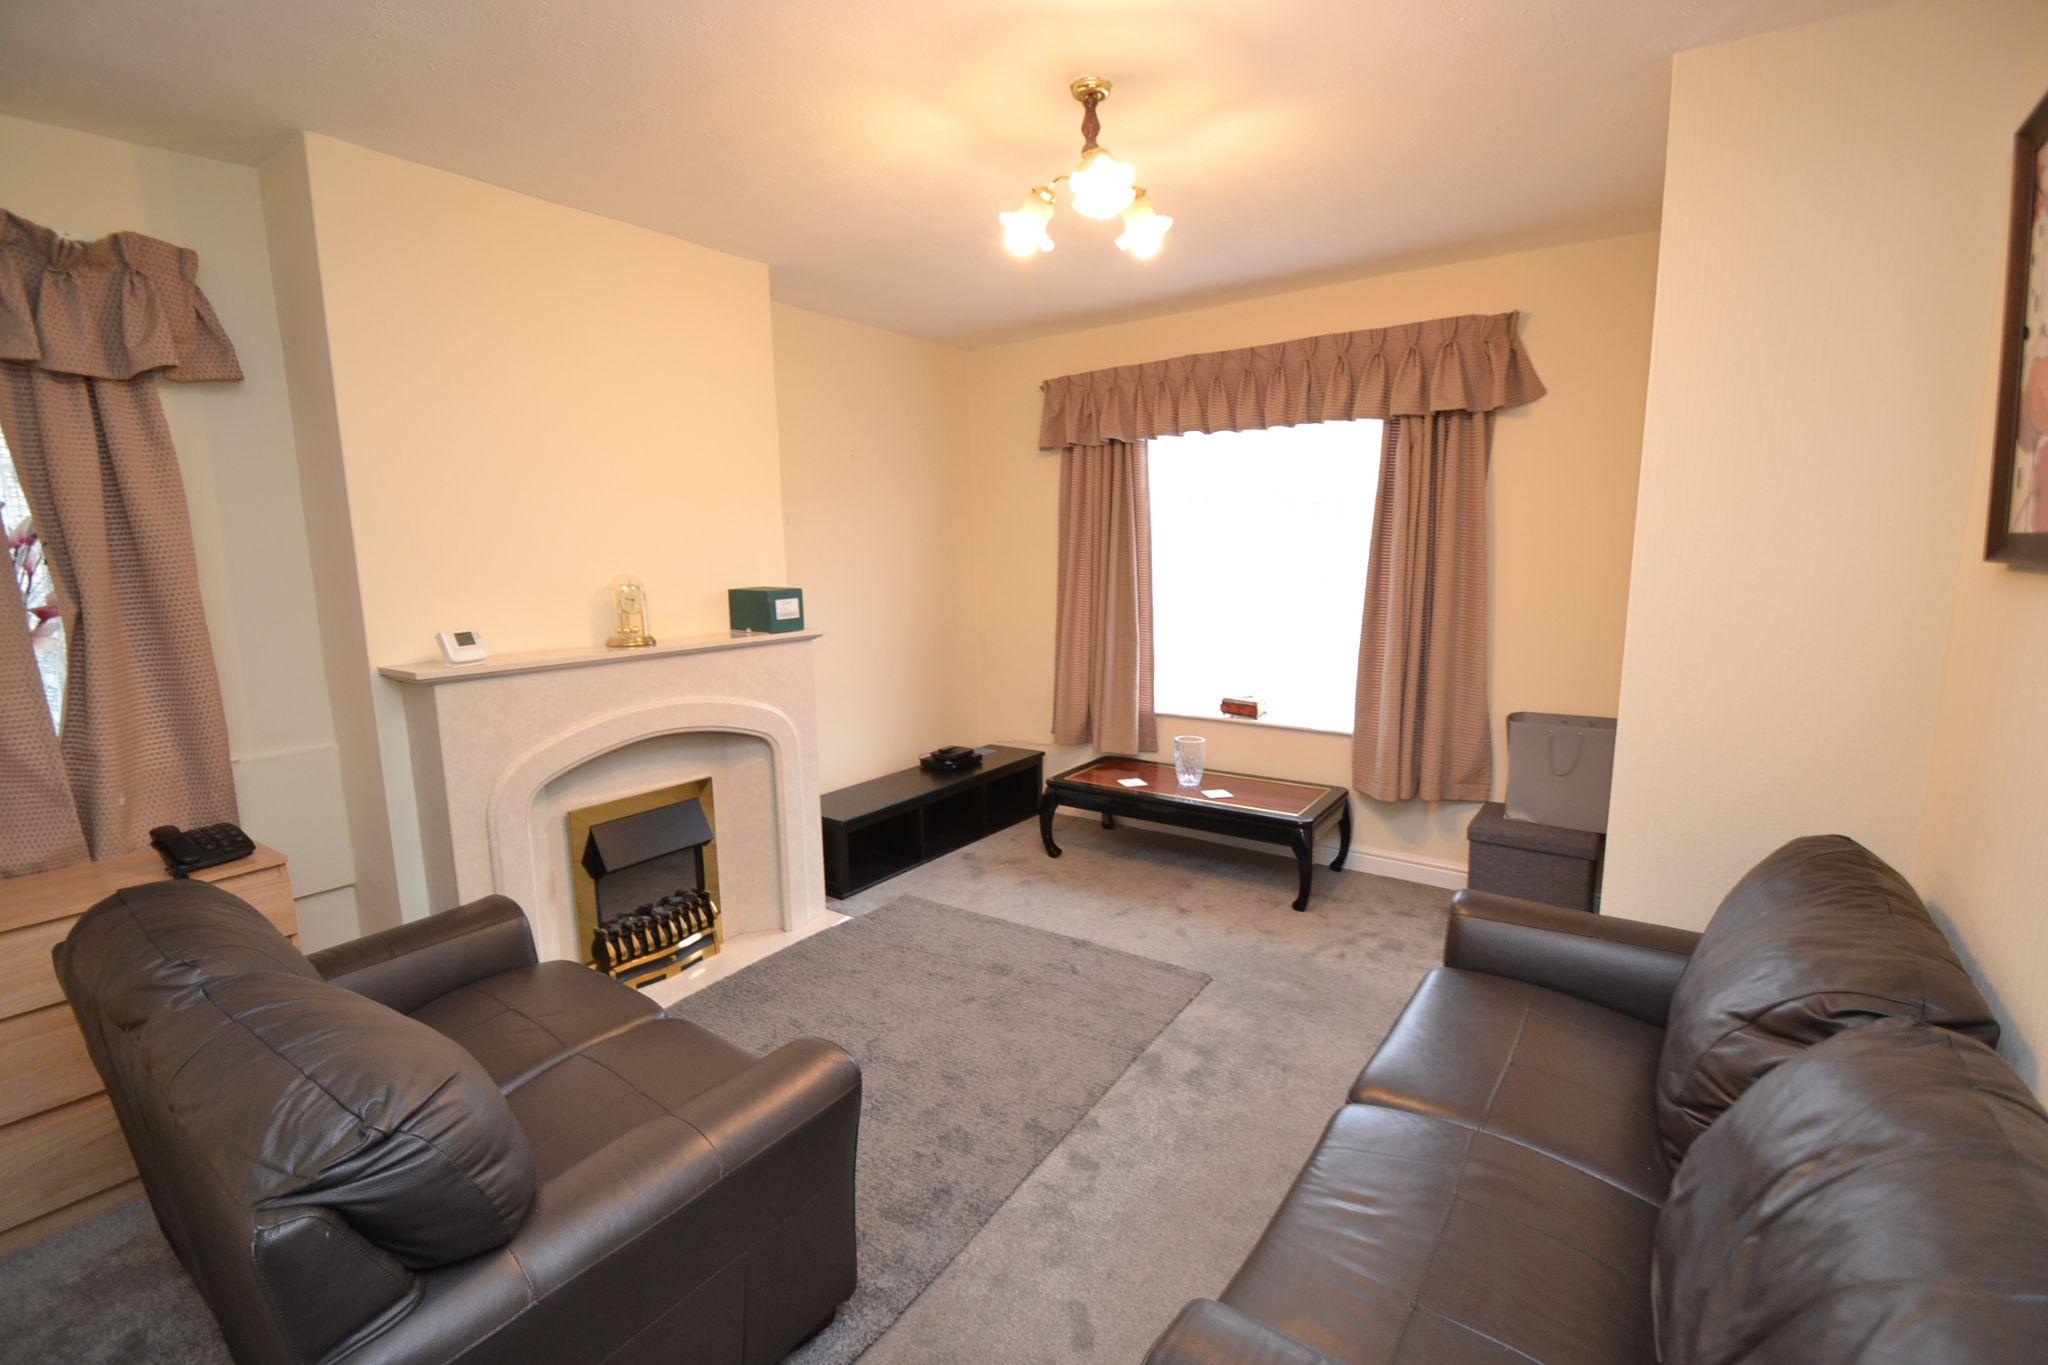 1 Bedroom Ground Floor Maisonette Flat/apartment For Sale - Photograph 2